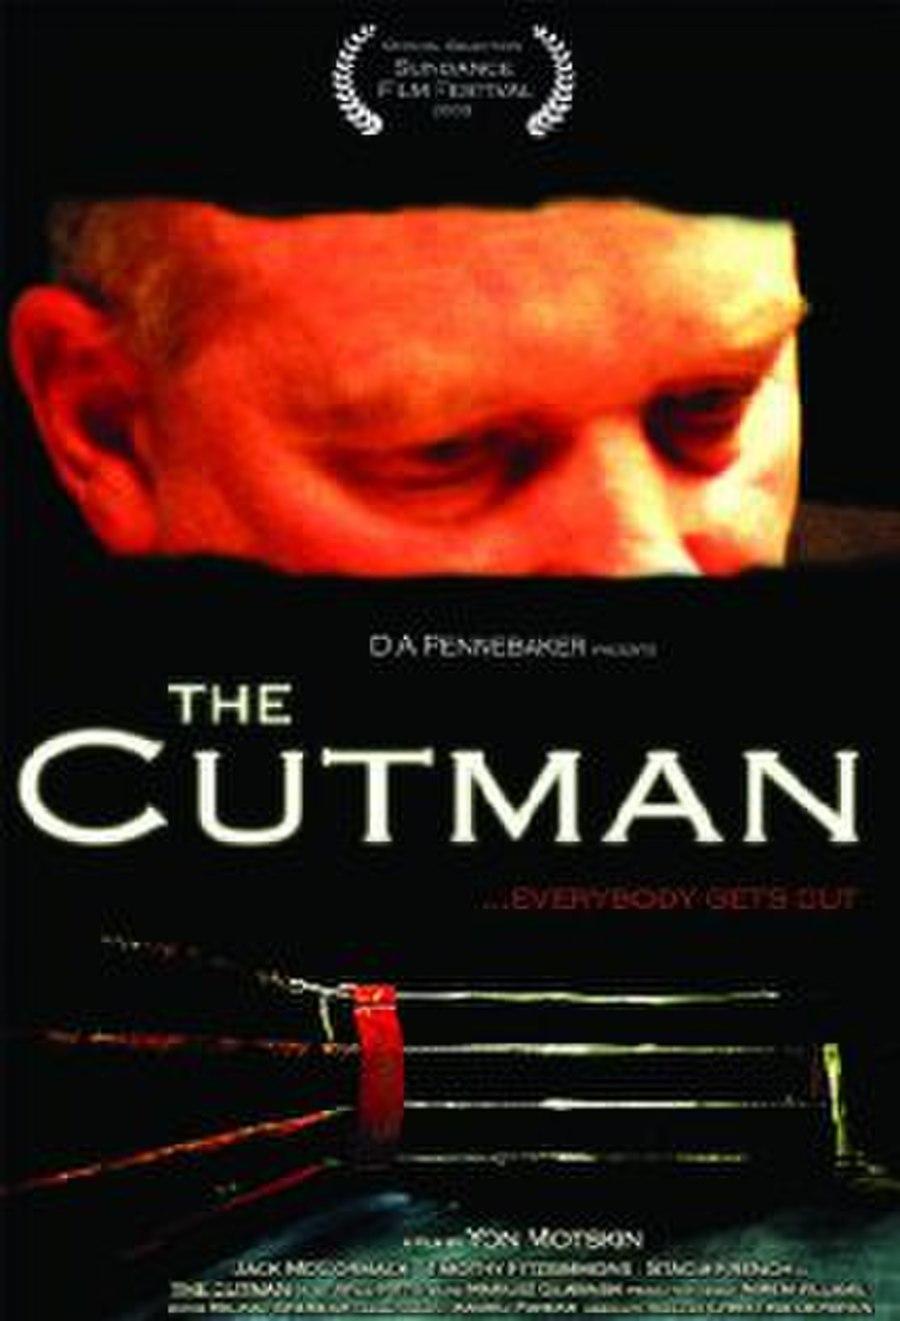 The Cutman